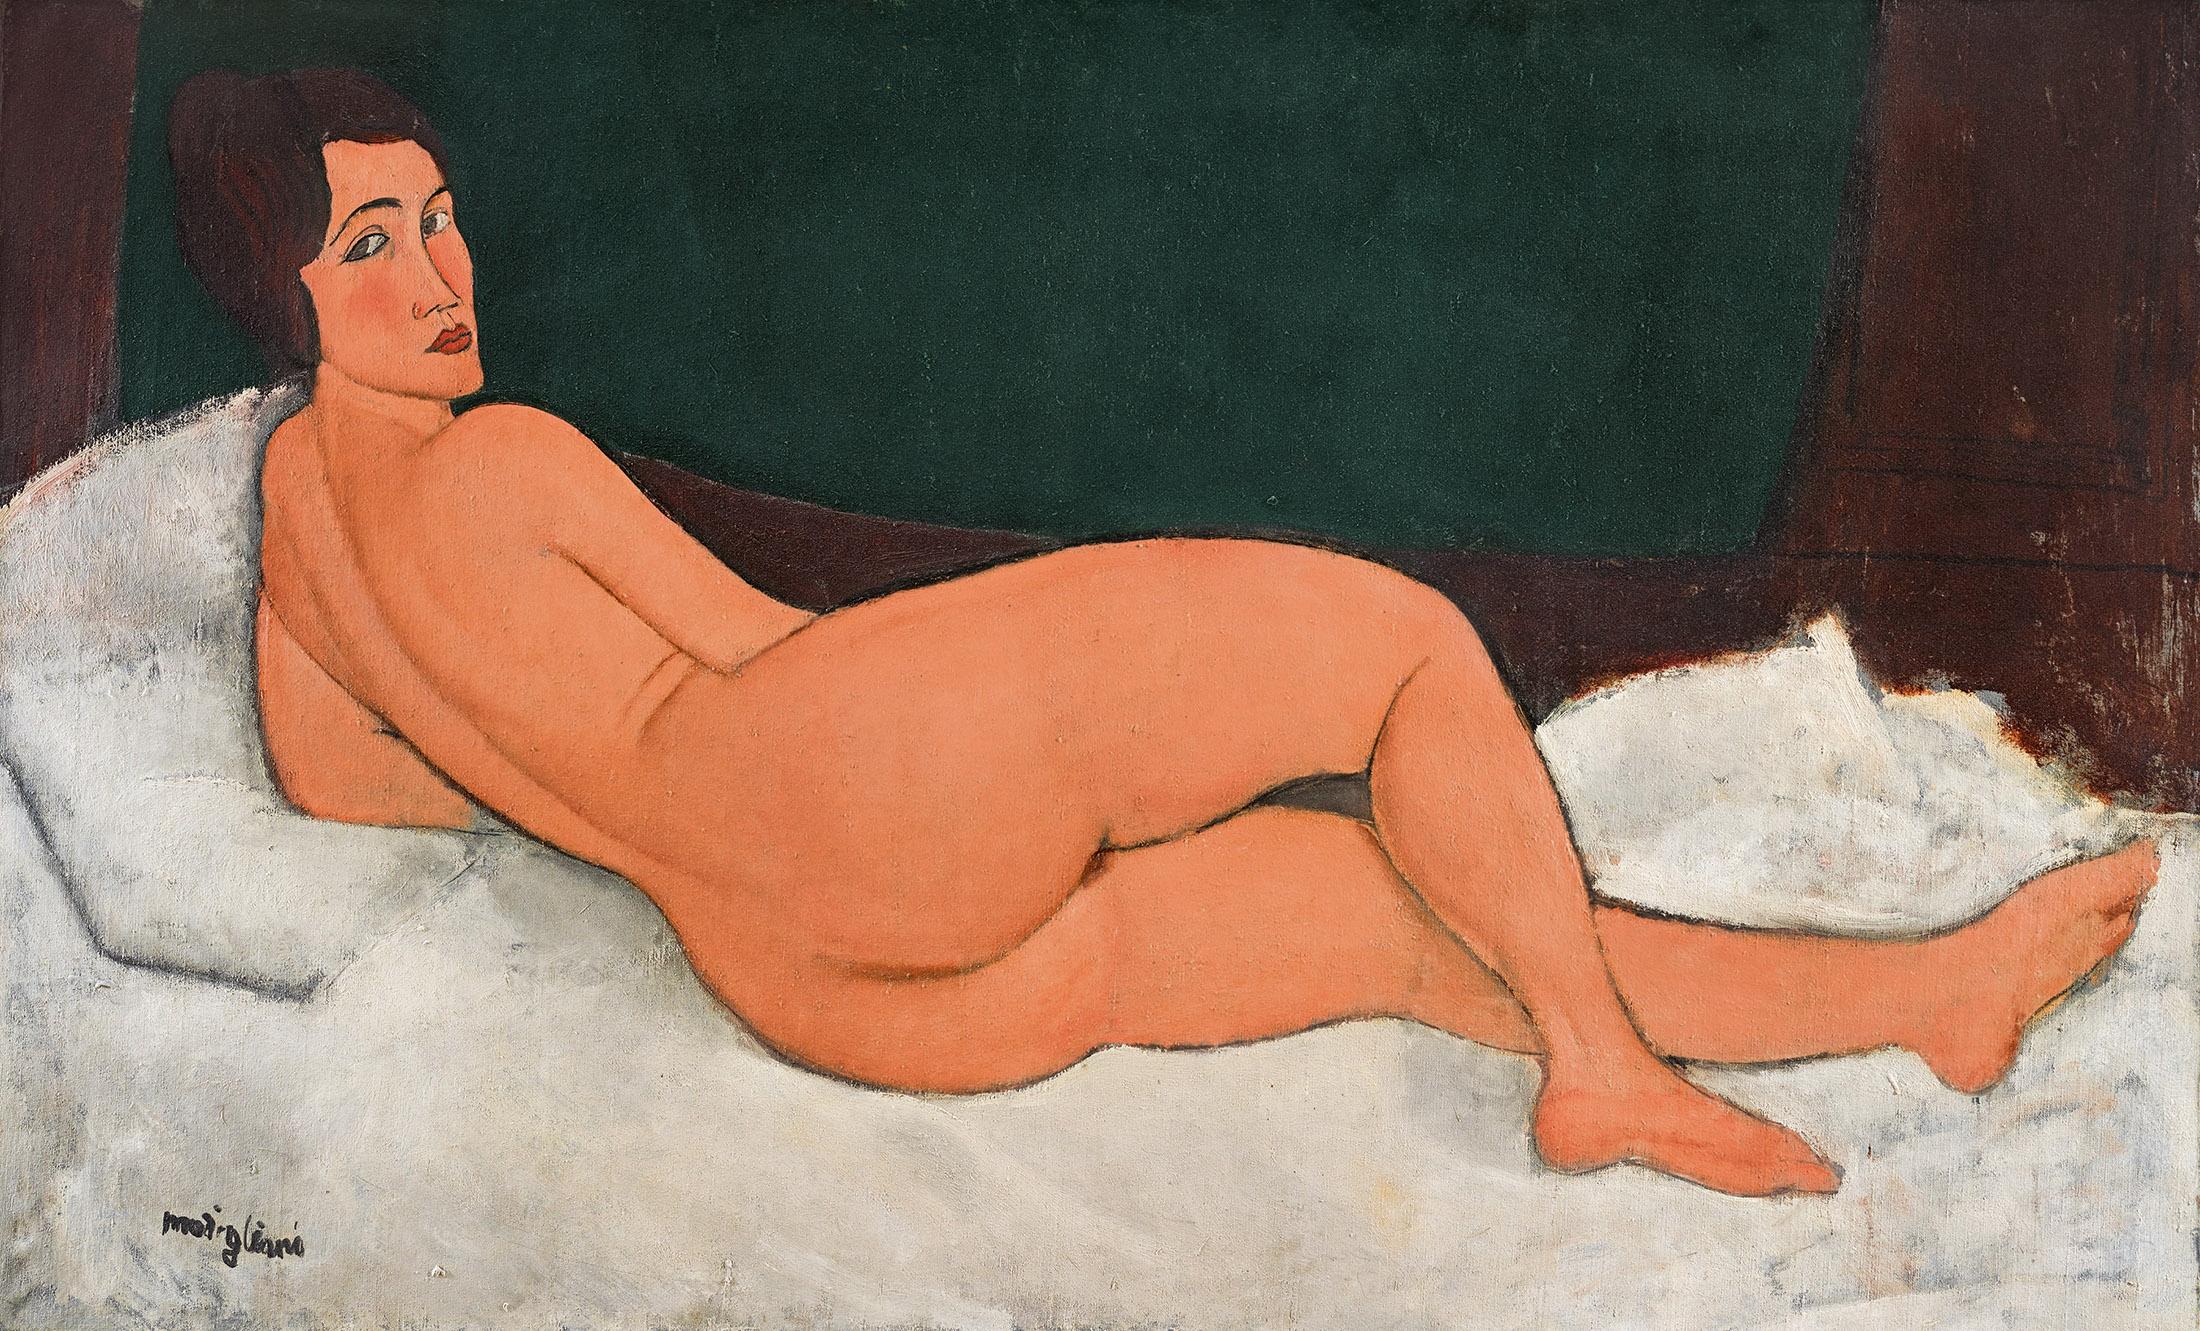 Billionaire's Secrets on How to Make a Bundle in Art